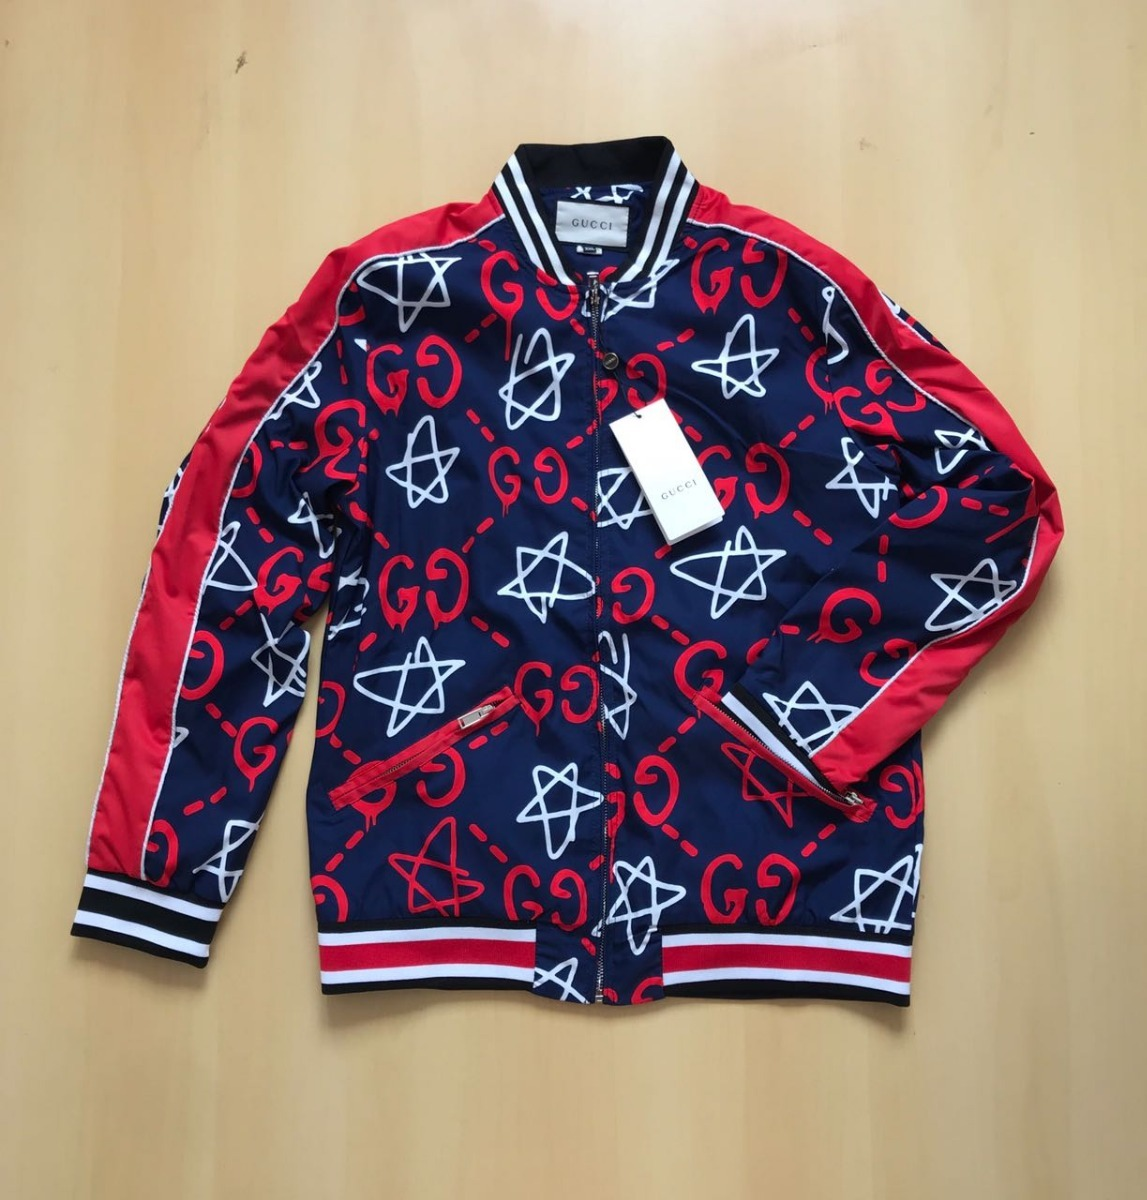 5c80b25e4f Jaqueta Jaco Blusa Gucci Original Importada Frete Gratis! - R$ 375 ...